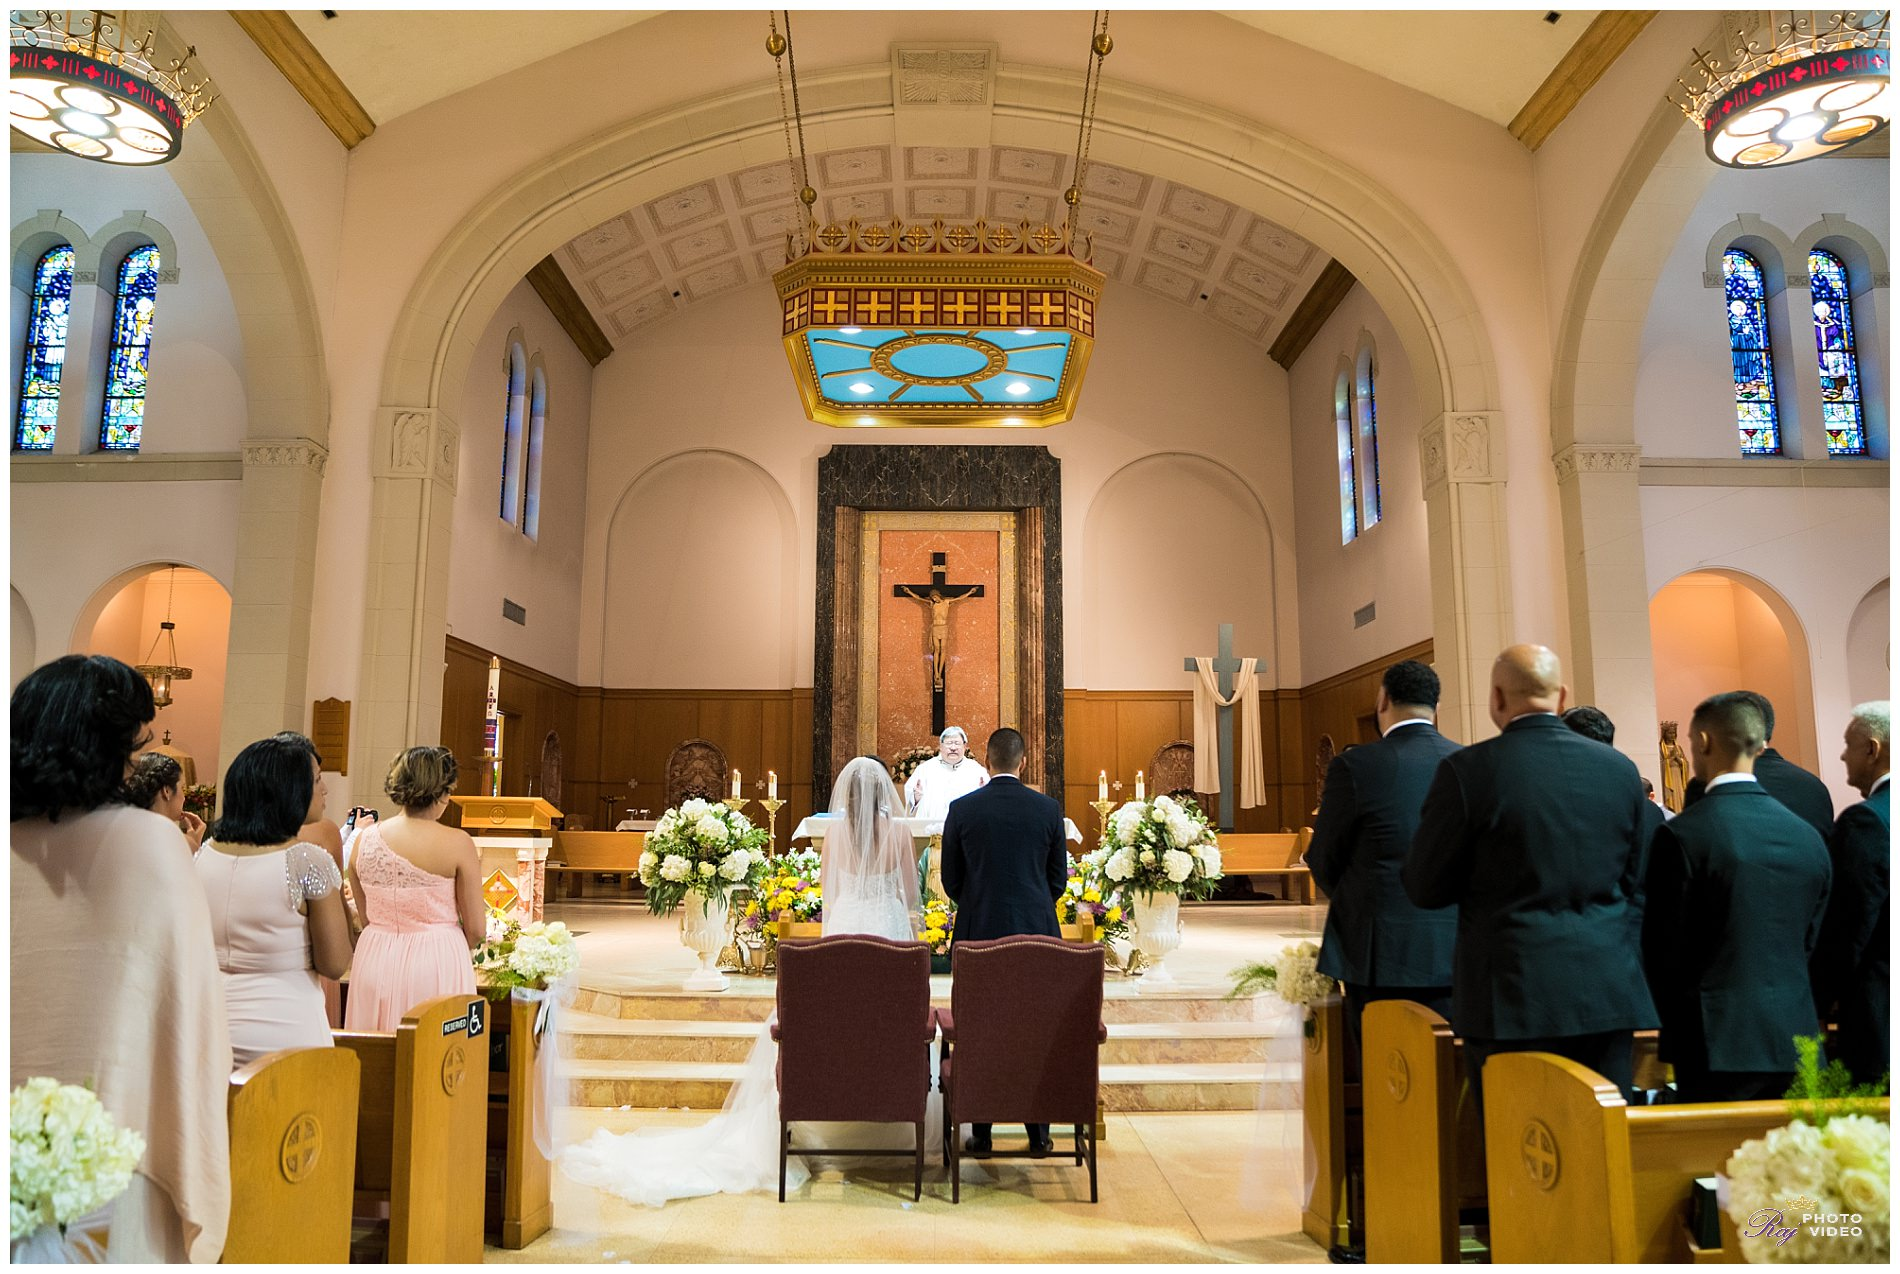 St-Valentines-Catholic-Church-Bloomfield-NJ-Wedding-Yanet-Jose-13.jpg